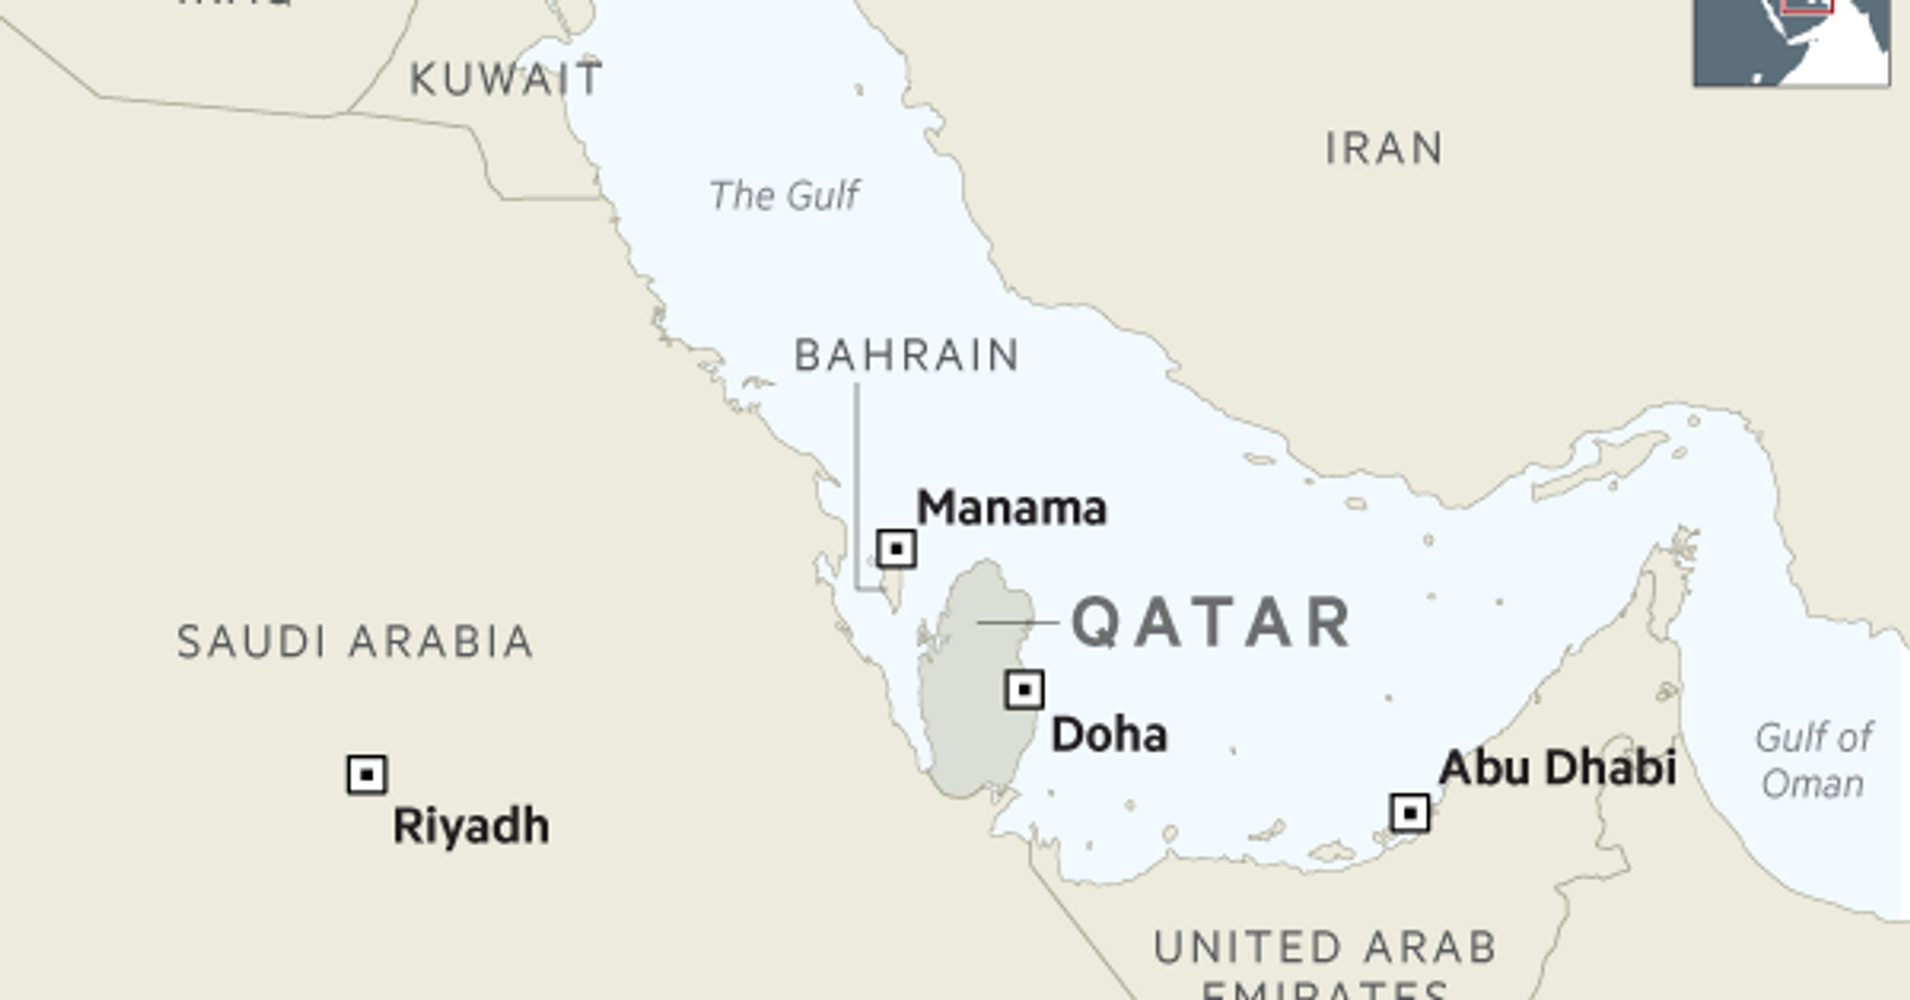 Saudi Arabia and Qatar – Trump Inflames the Family Feud